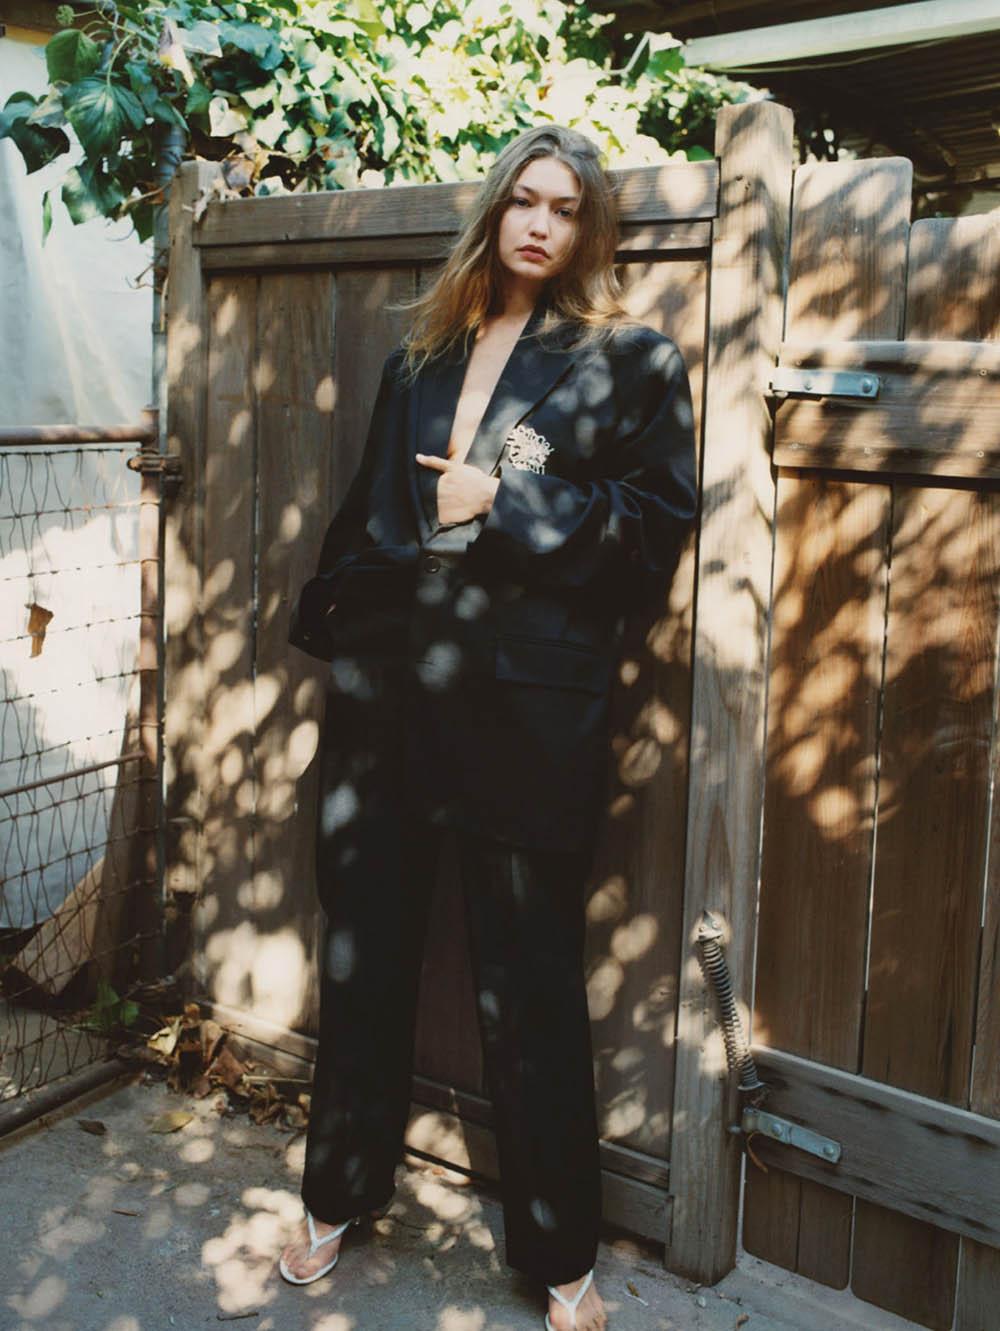 Gigi Hadid by Zoë Ghertner for British Vogue March 2020